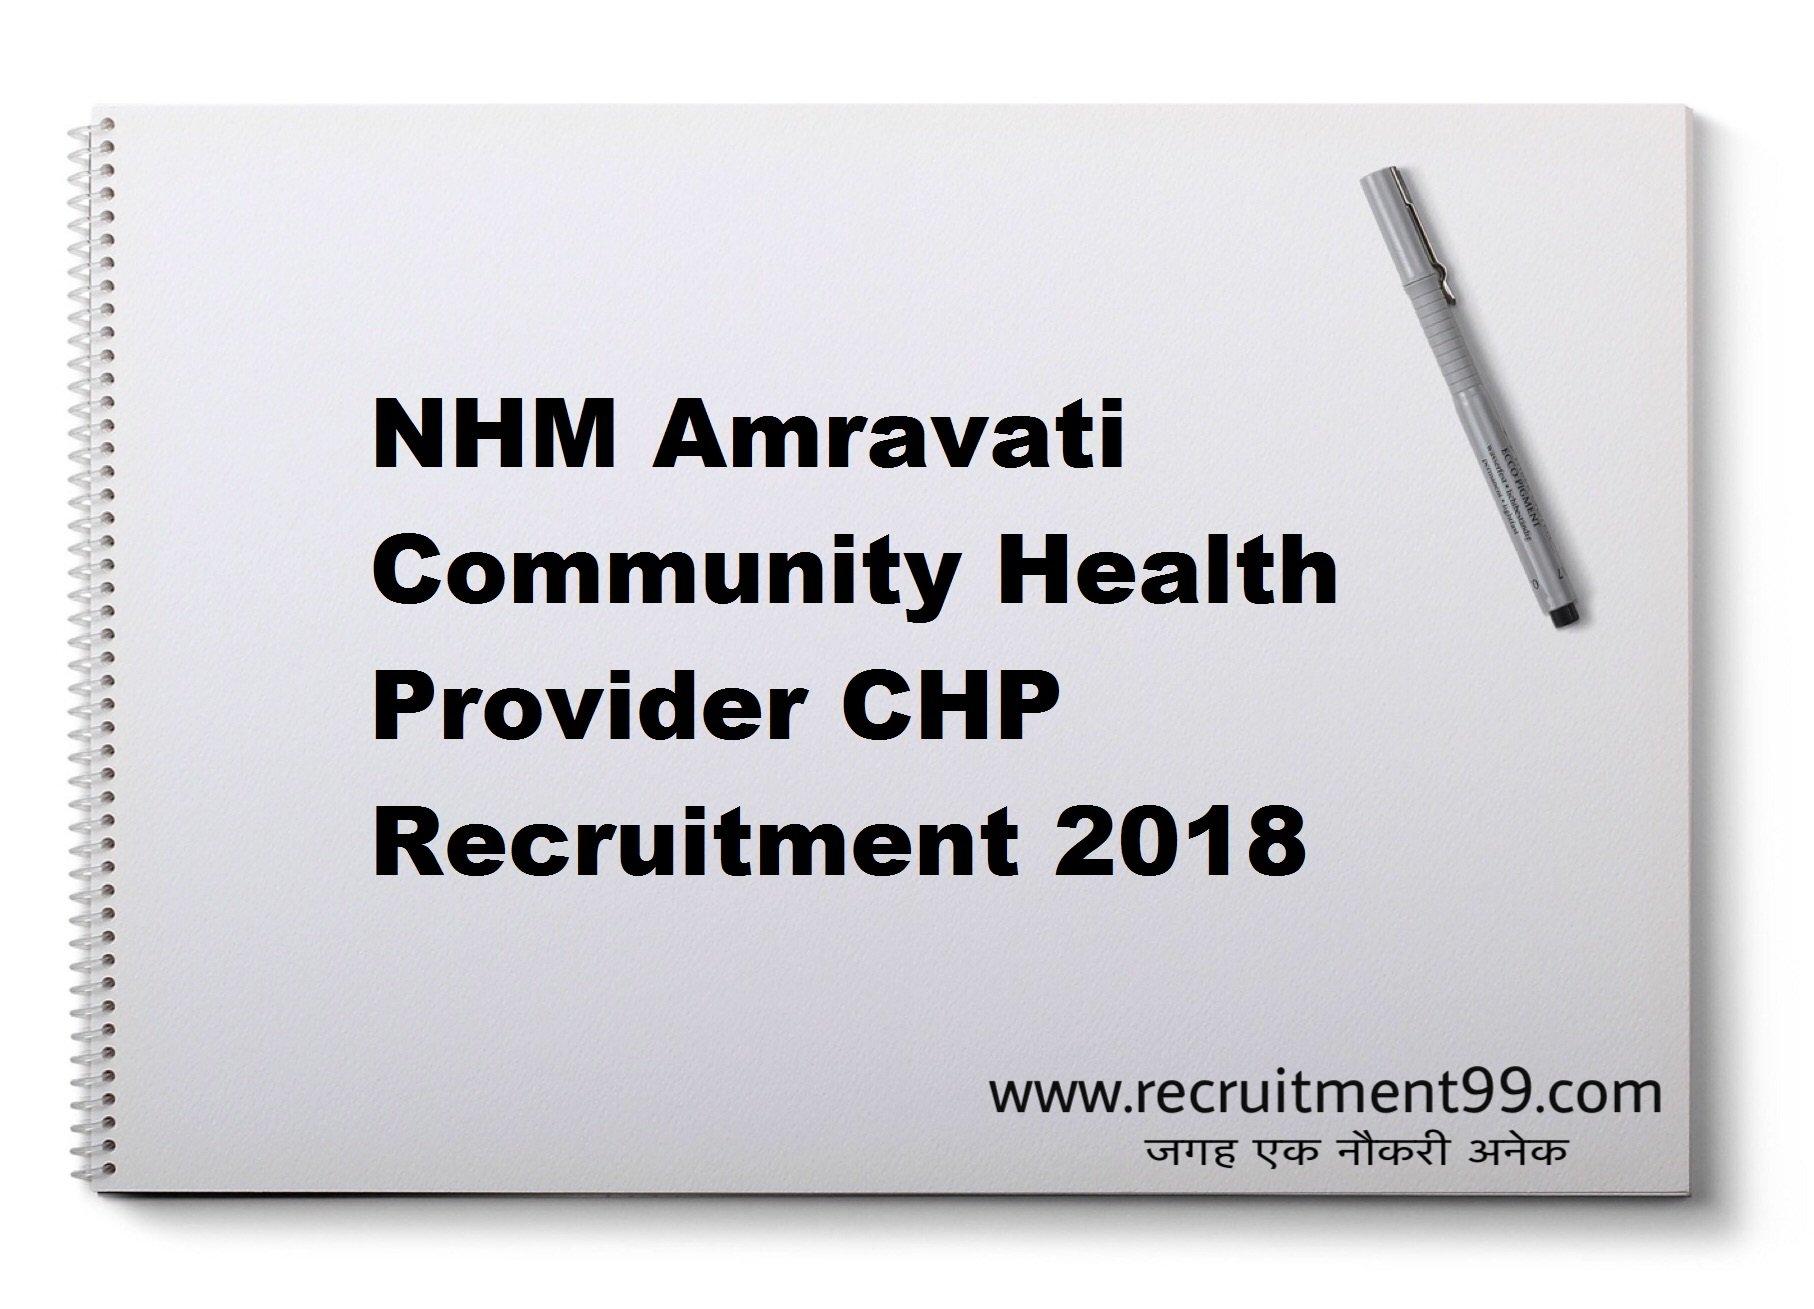 NHM Amravati Community Health Provider CHP Recruitment Admit Card Result 2018